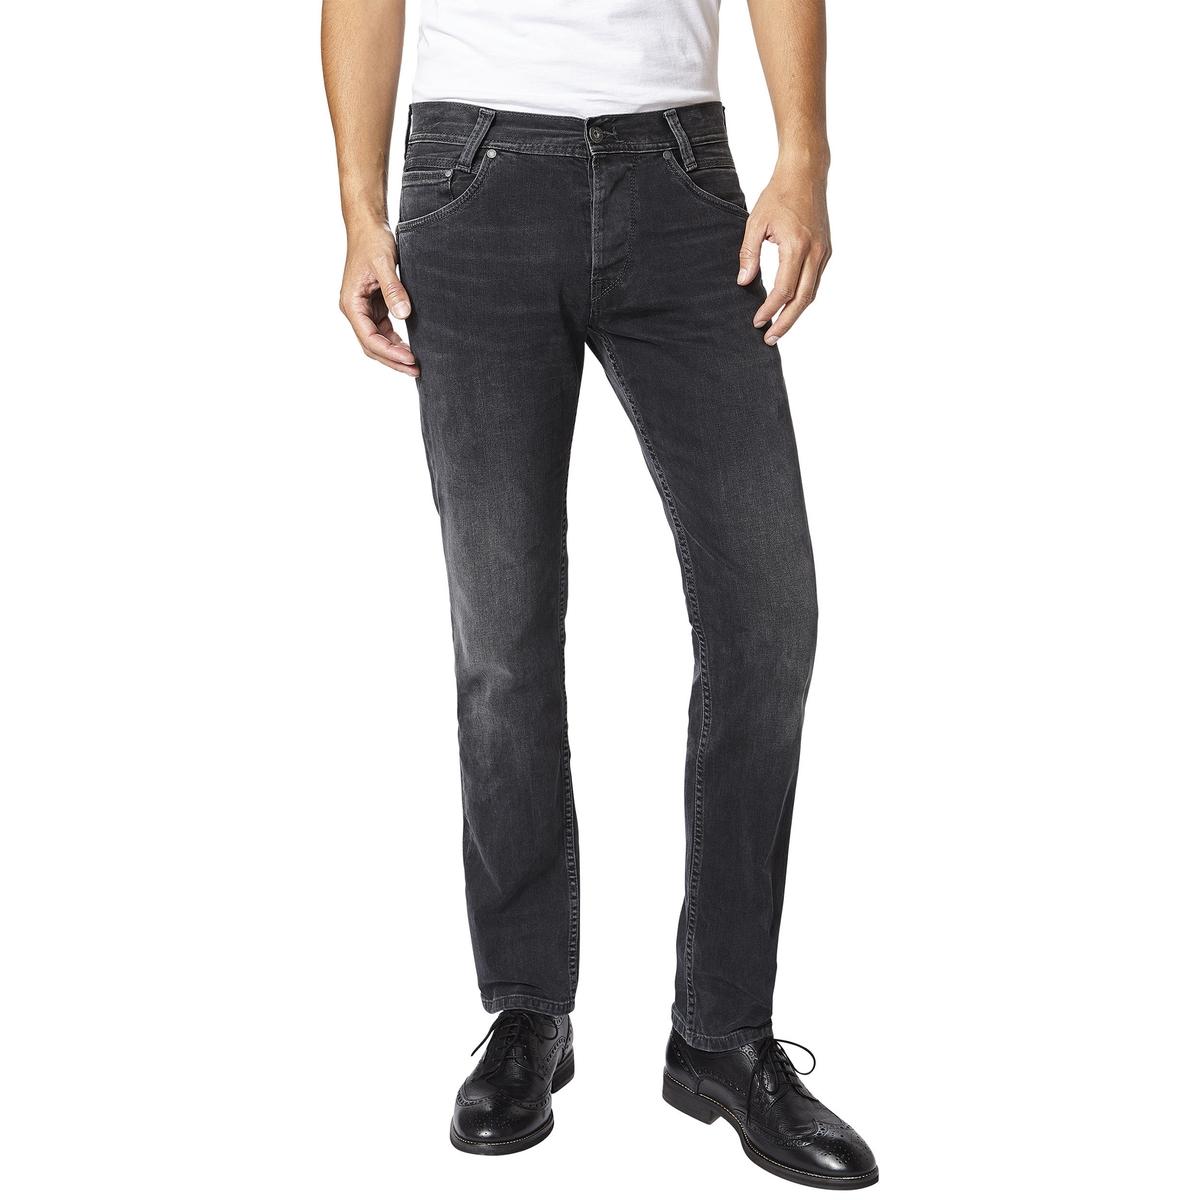 Джинсы узкие insight джинсы узкие insight jeans tie dye blue